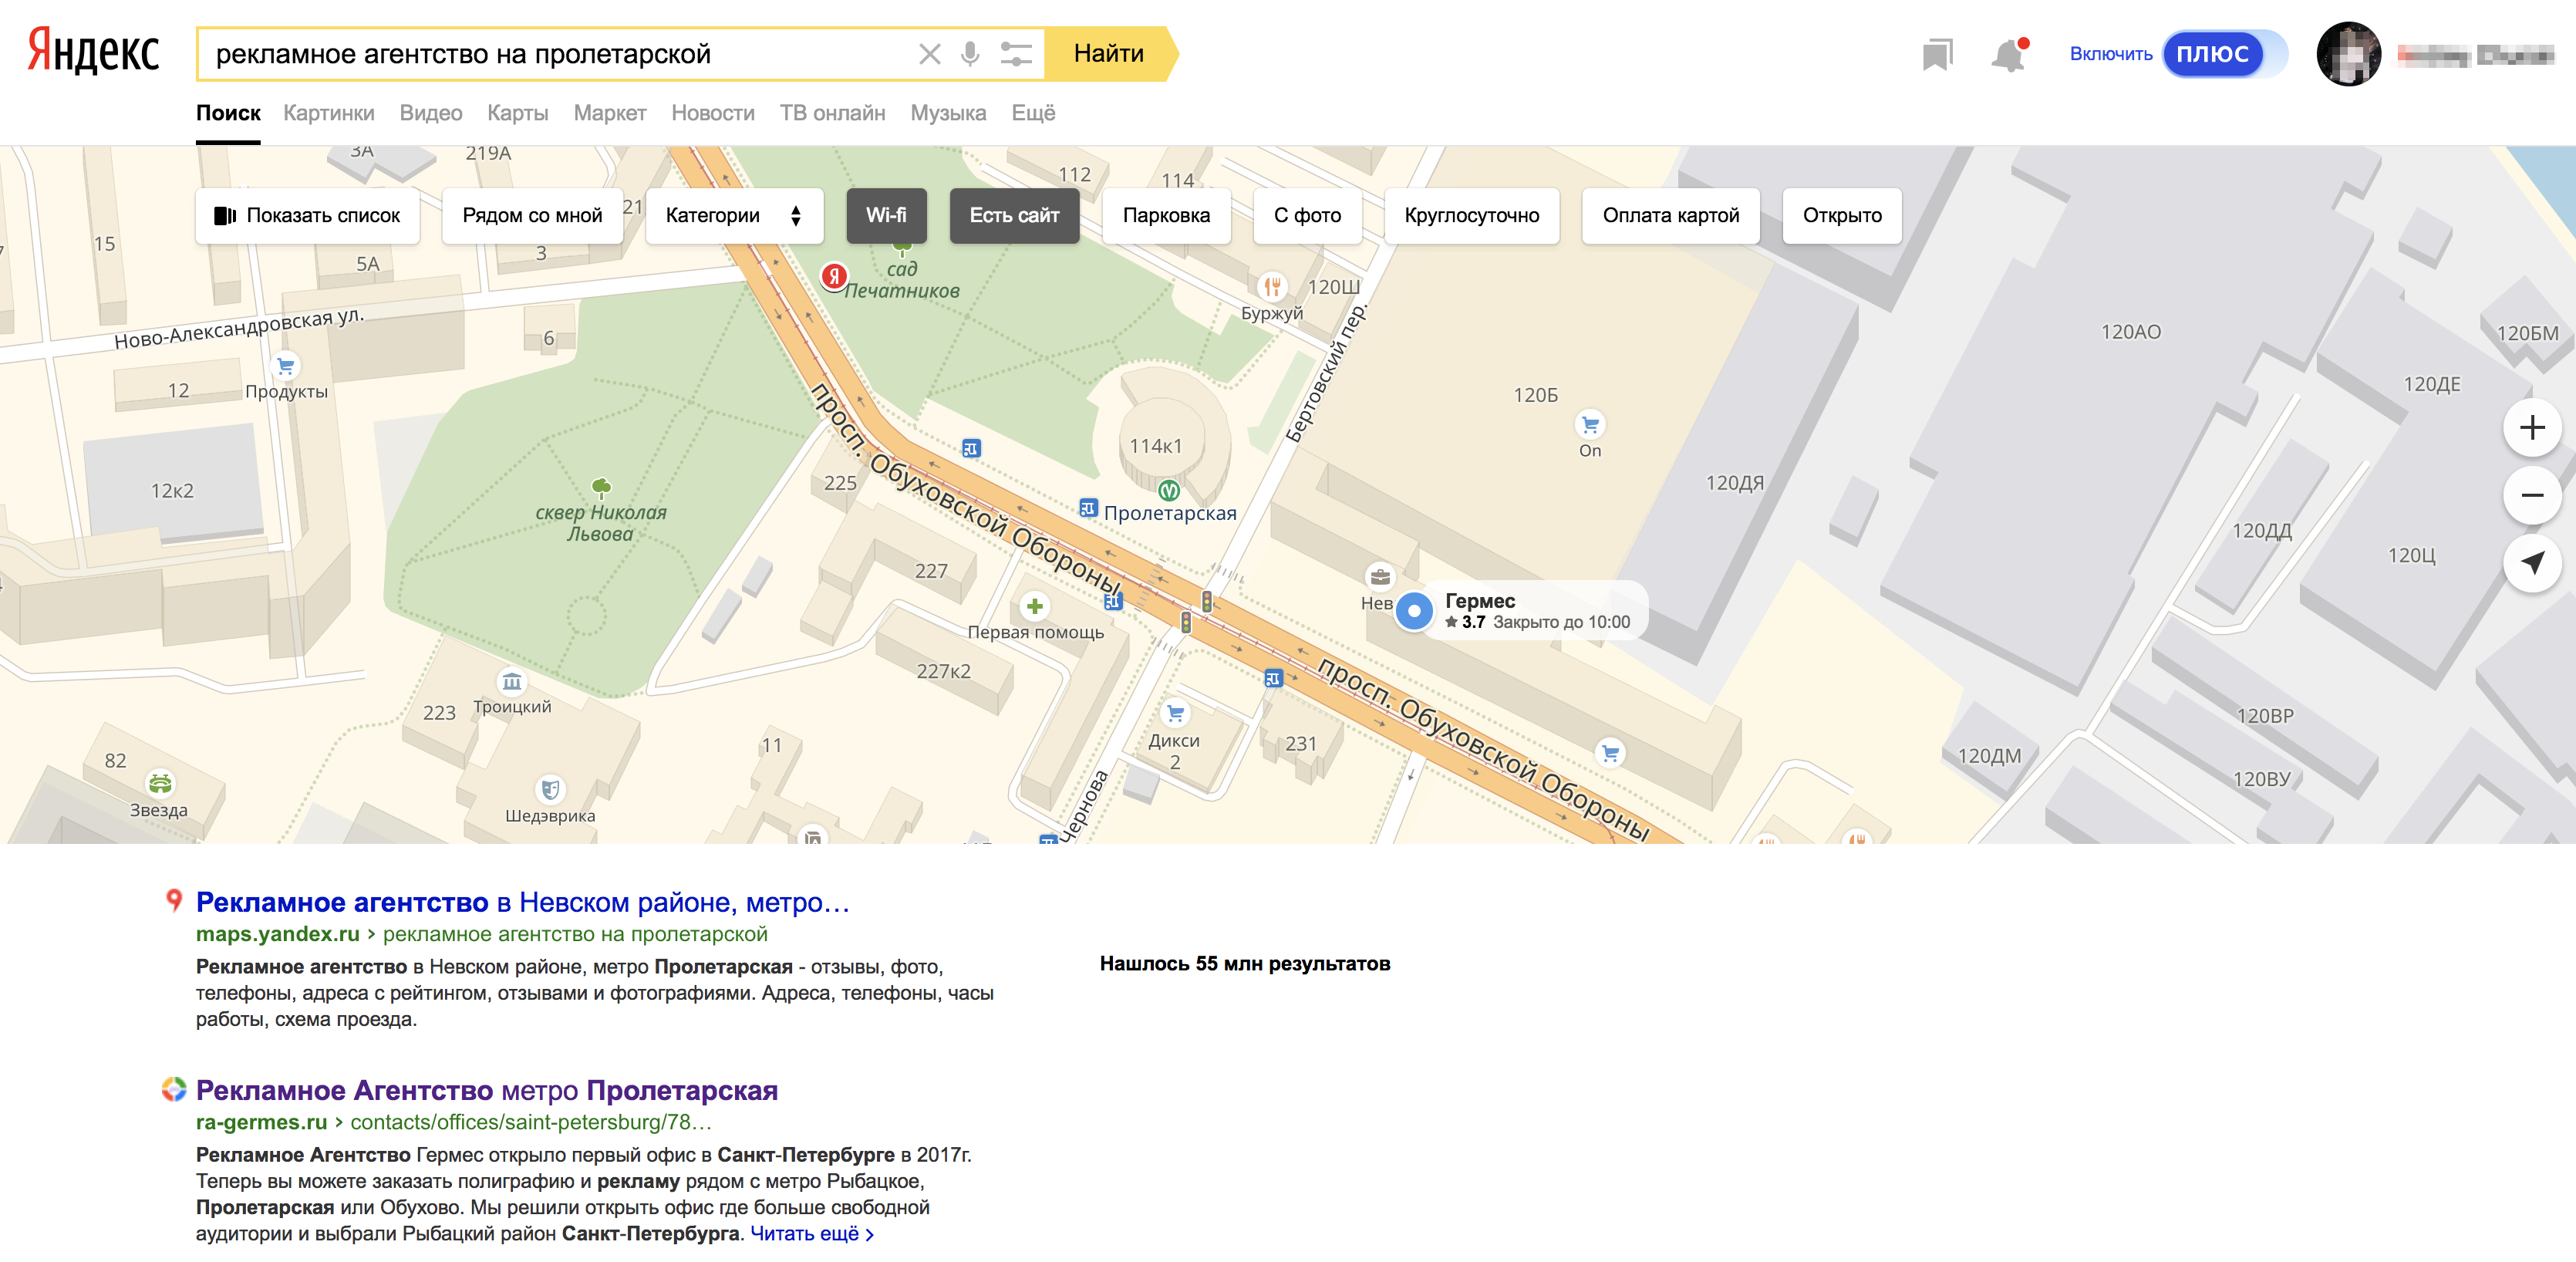 Список компаний на быстрой карте Yandex